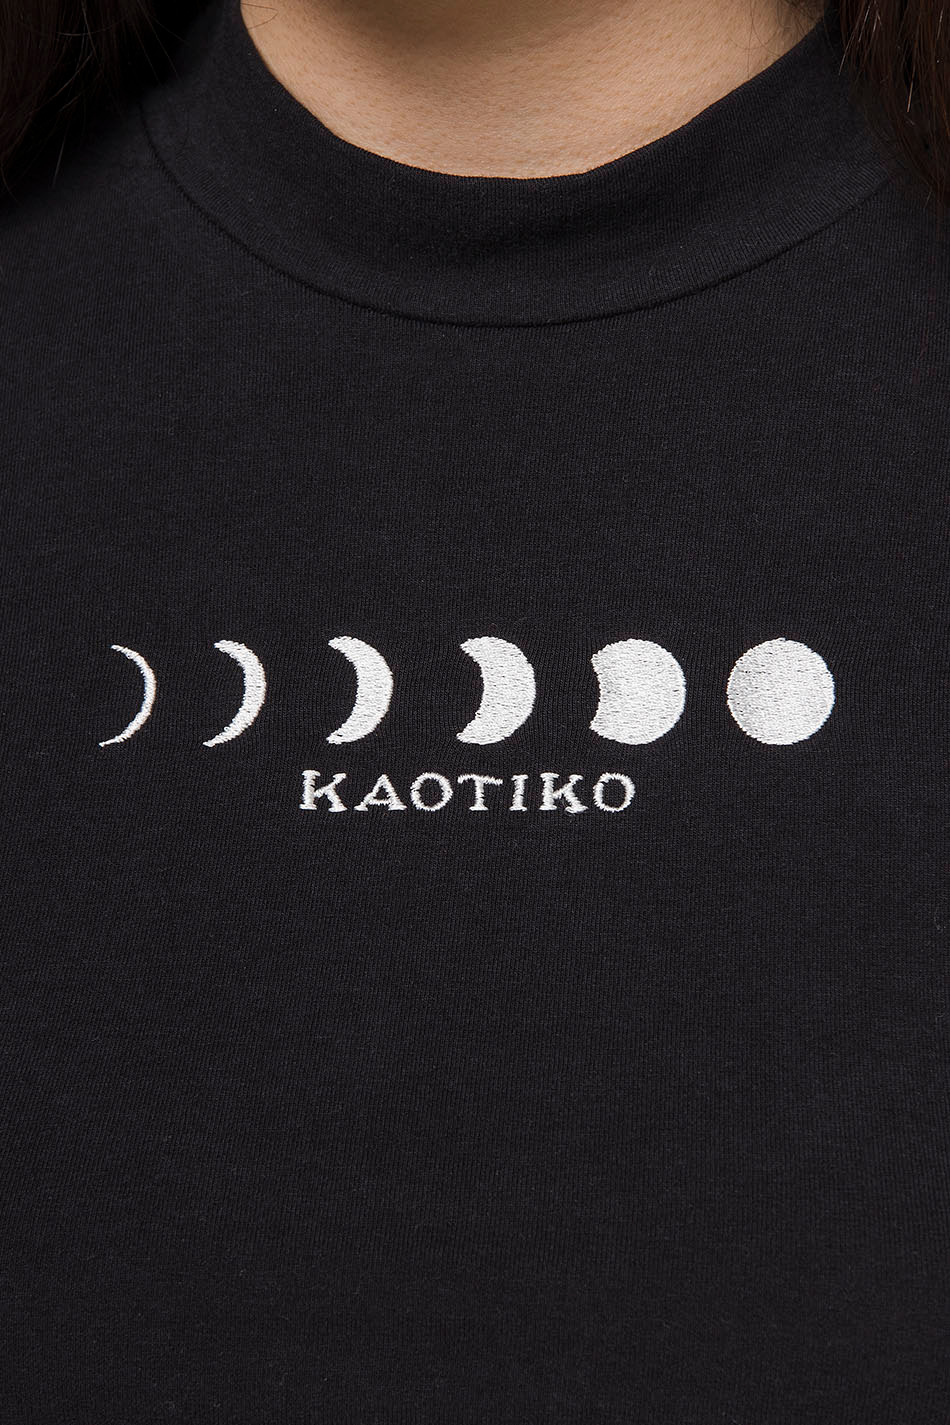 Camiseta Moon Black